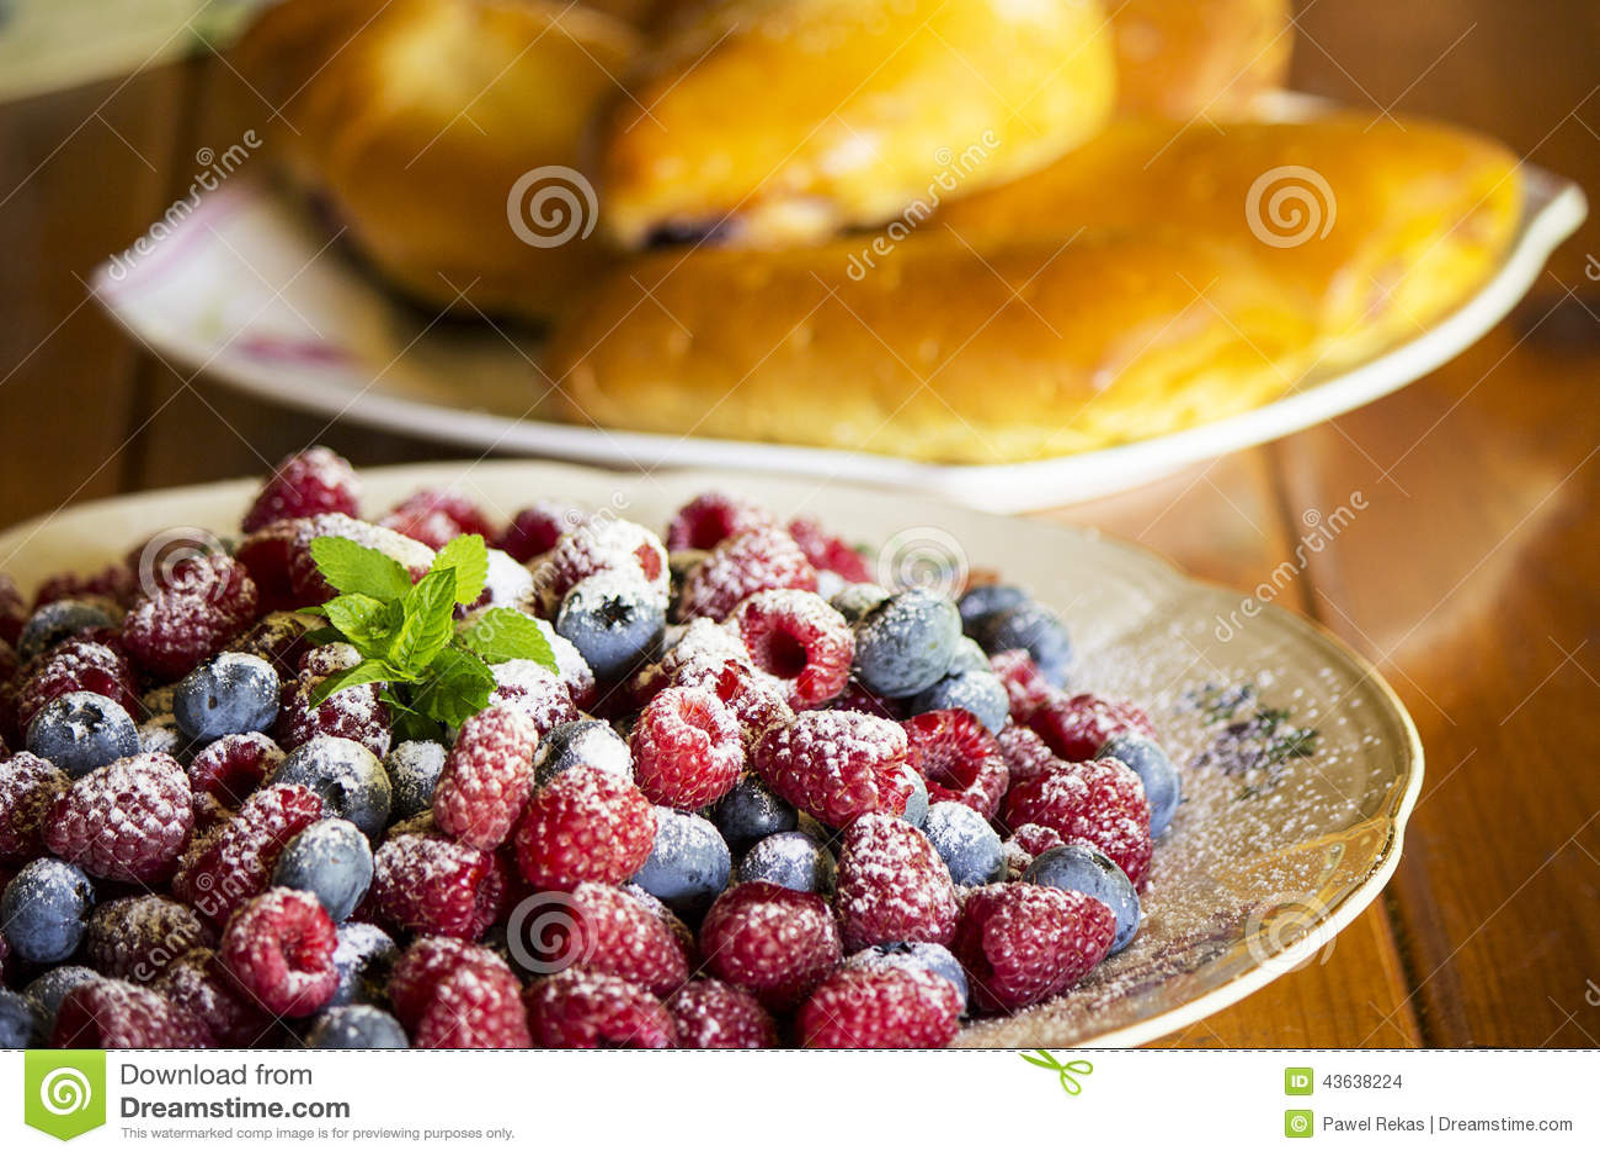 Raspberry-Blueberry Gazpacho With Fresh Mint Recipes — Dishmaps